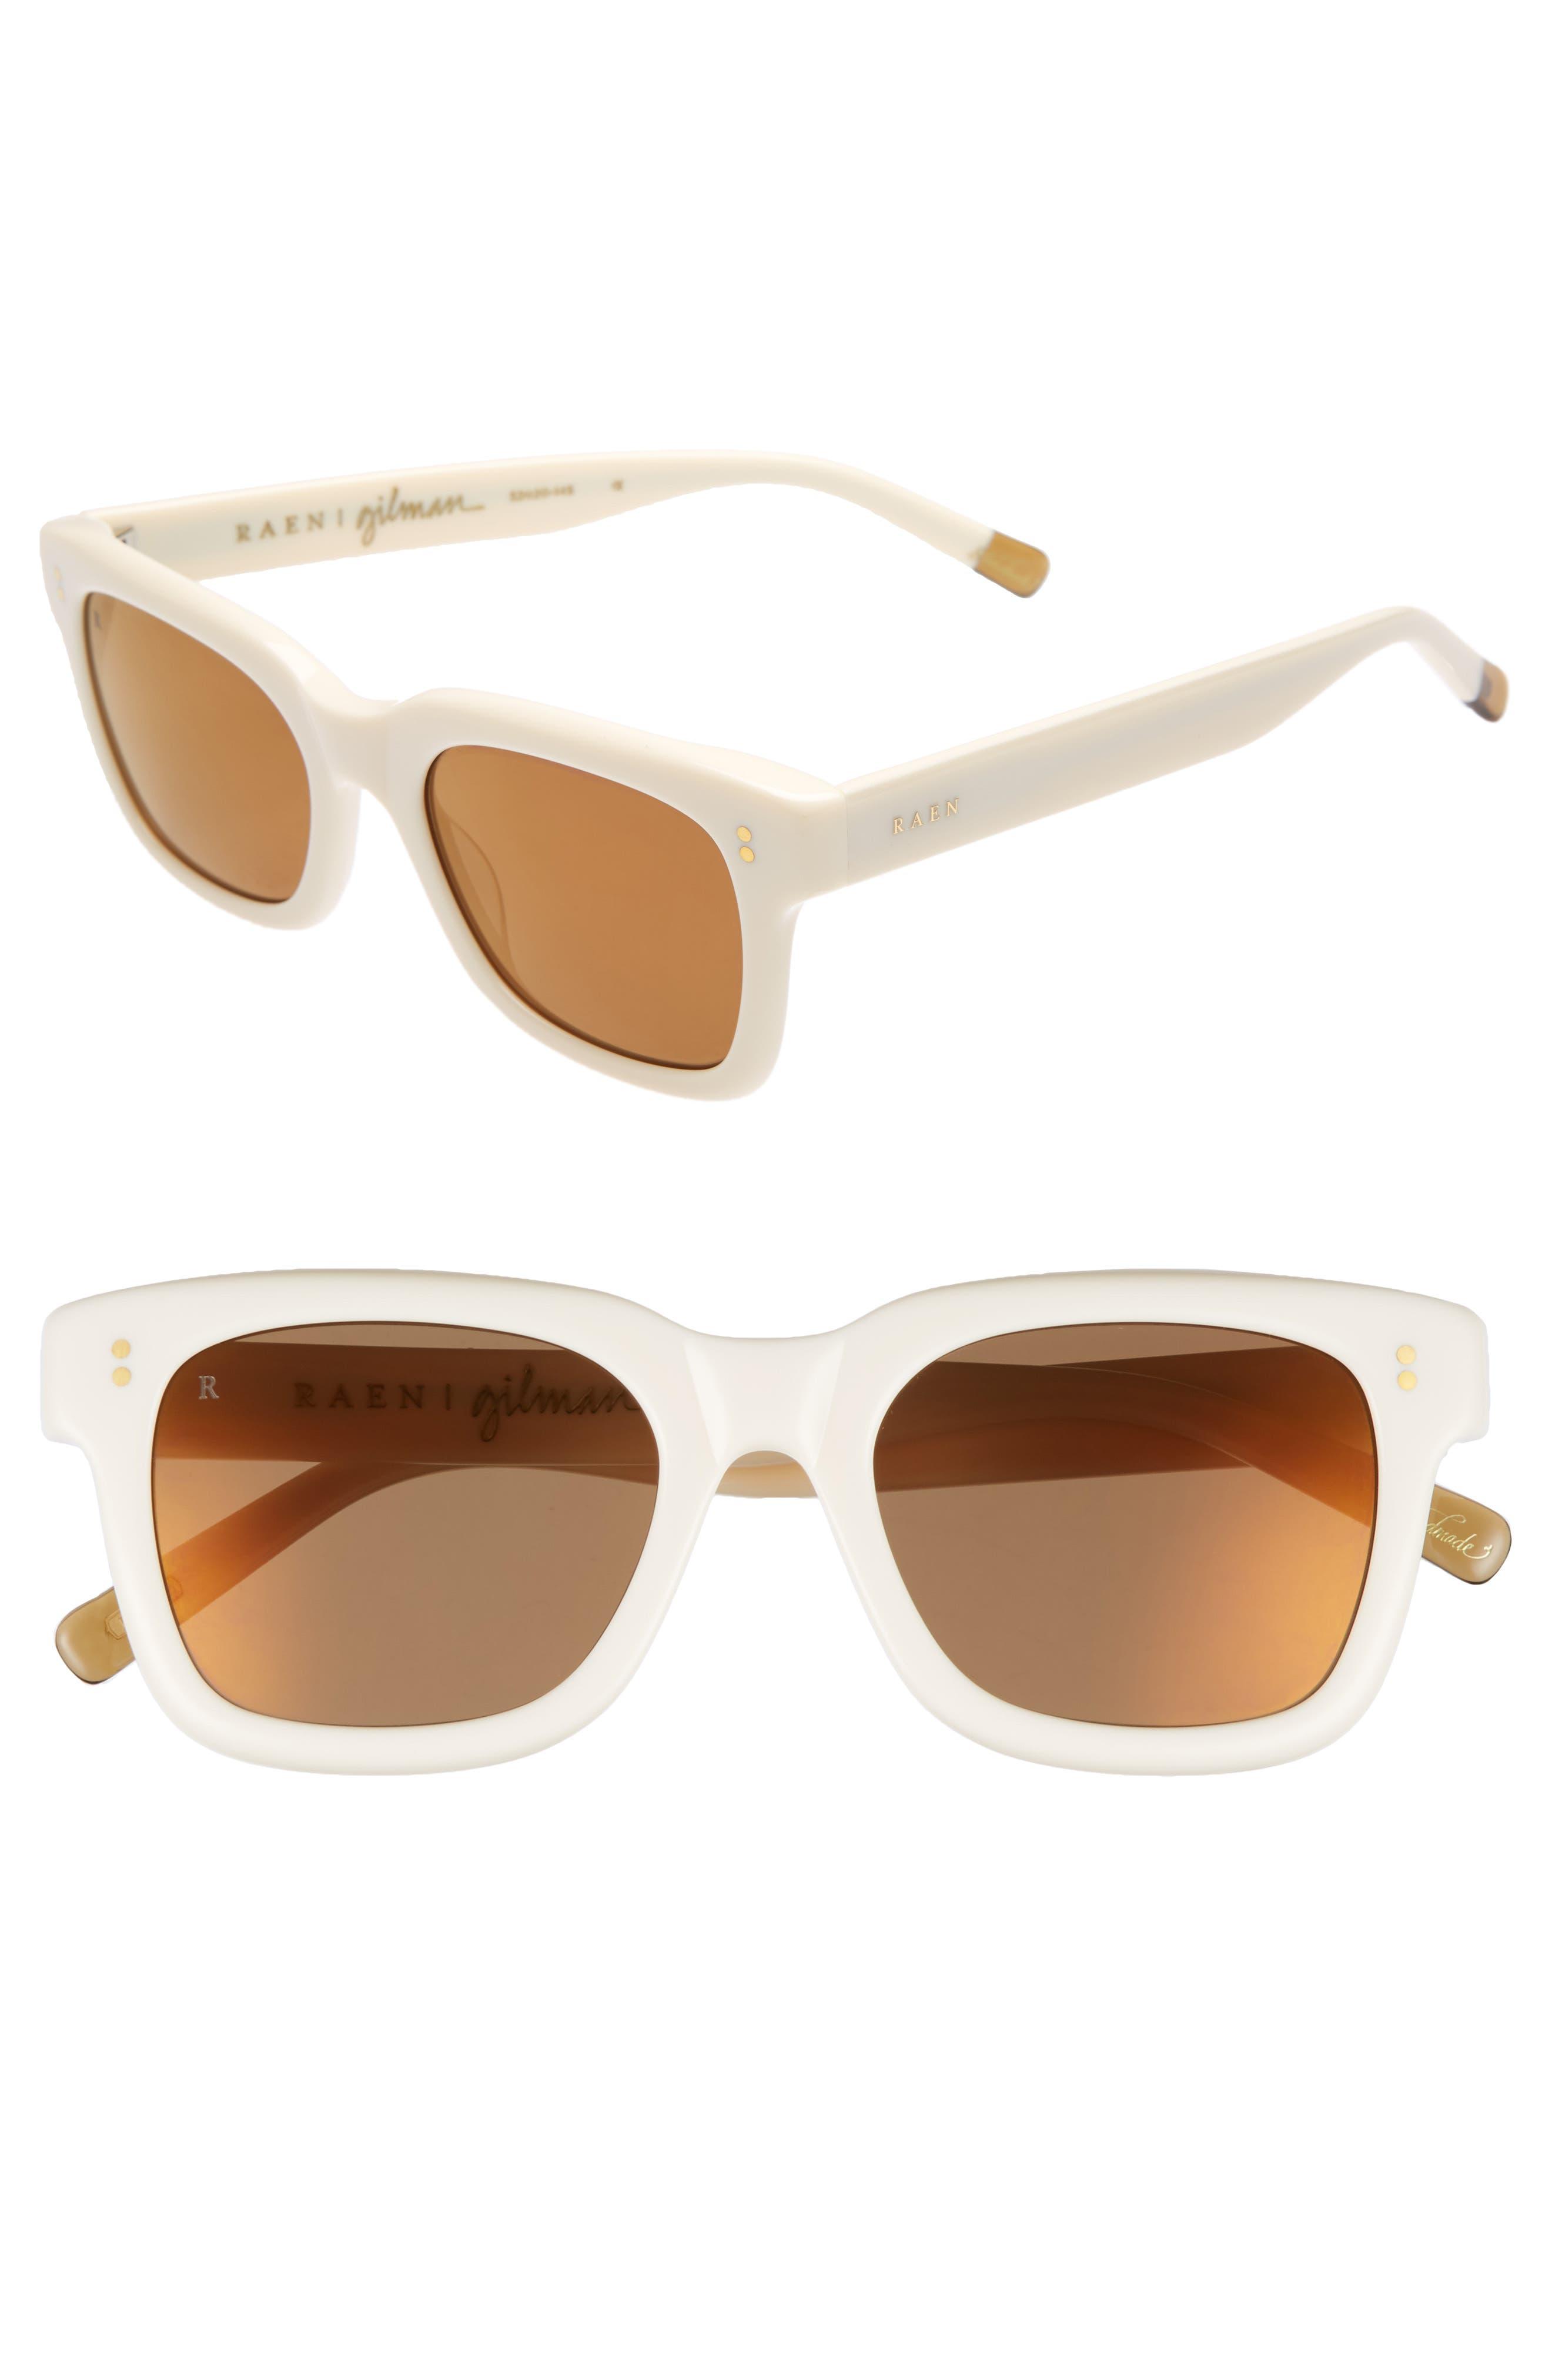 Gilman 52mm Mirrored Polarized Sunglasses,                         Main,                         color, 650